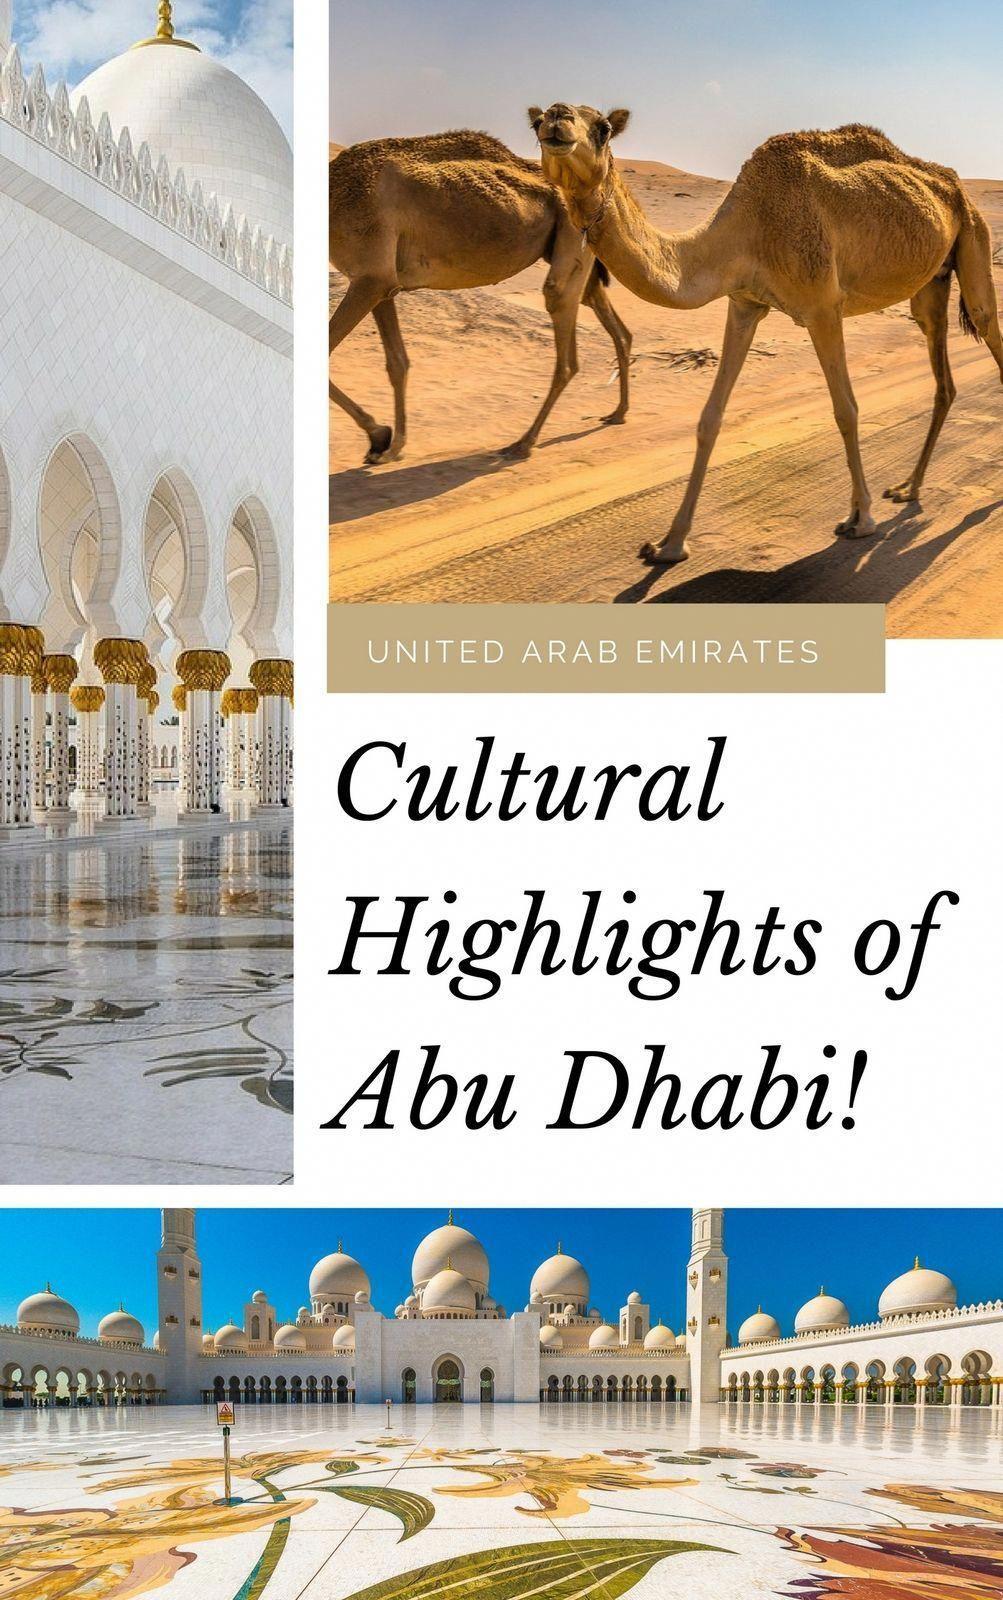 CultureTravel Culture travel, Abu dhabi, Dubai things to do